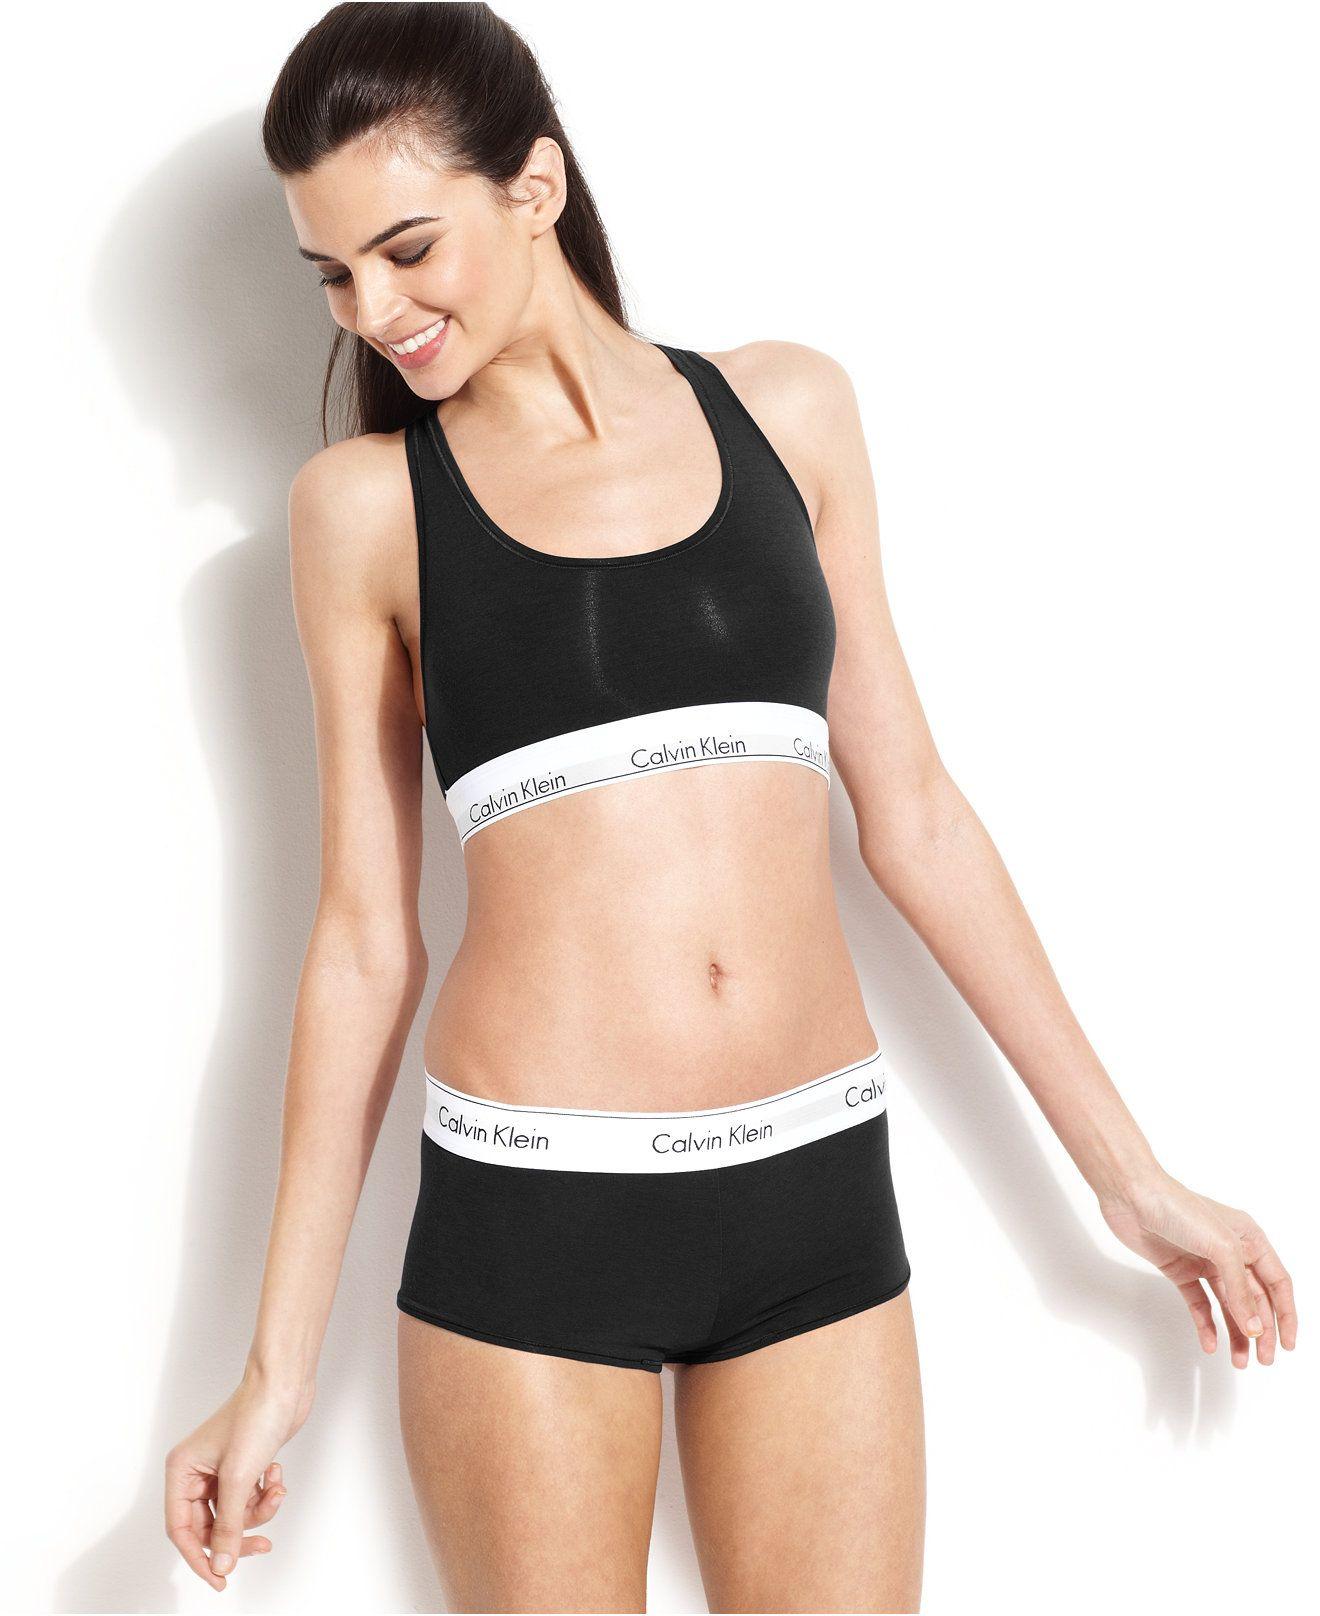 Calvin Klein Modern Cotton Logo Bralette F3785 - Bras, Panties ...